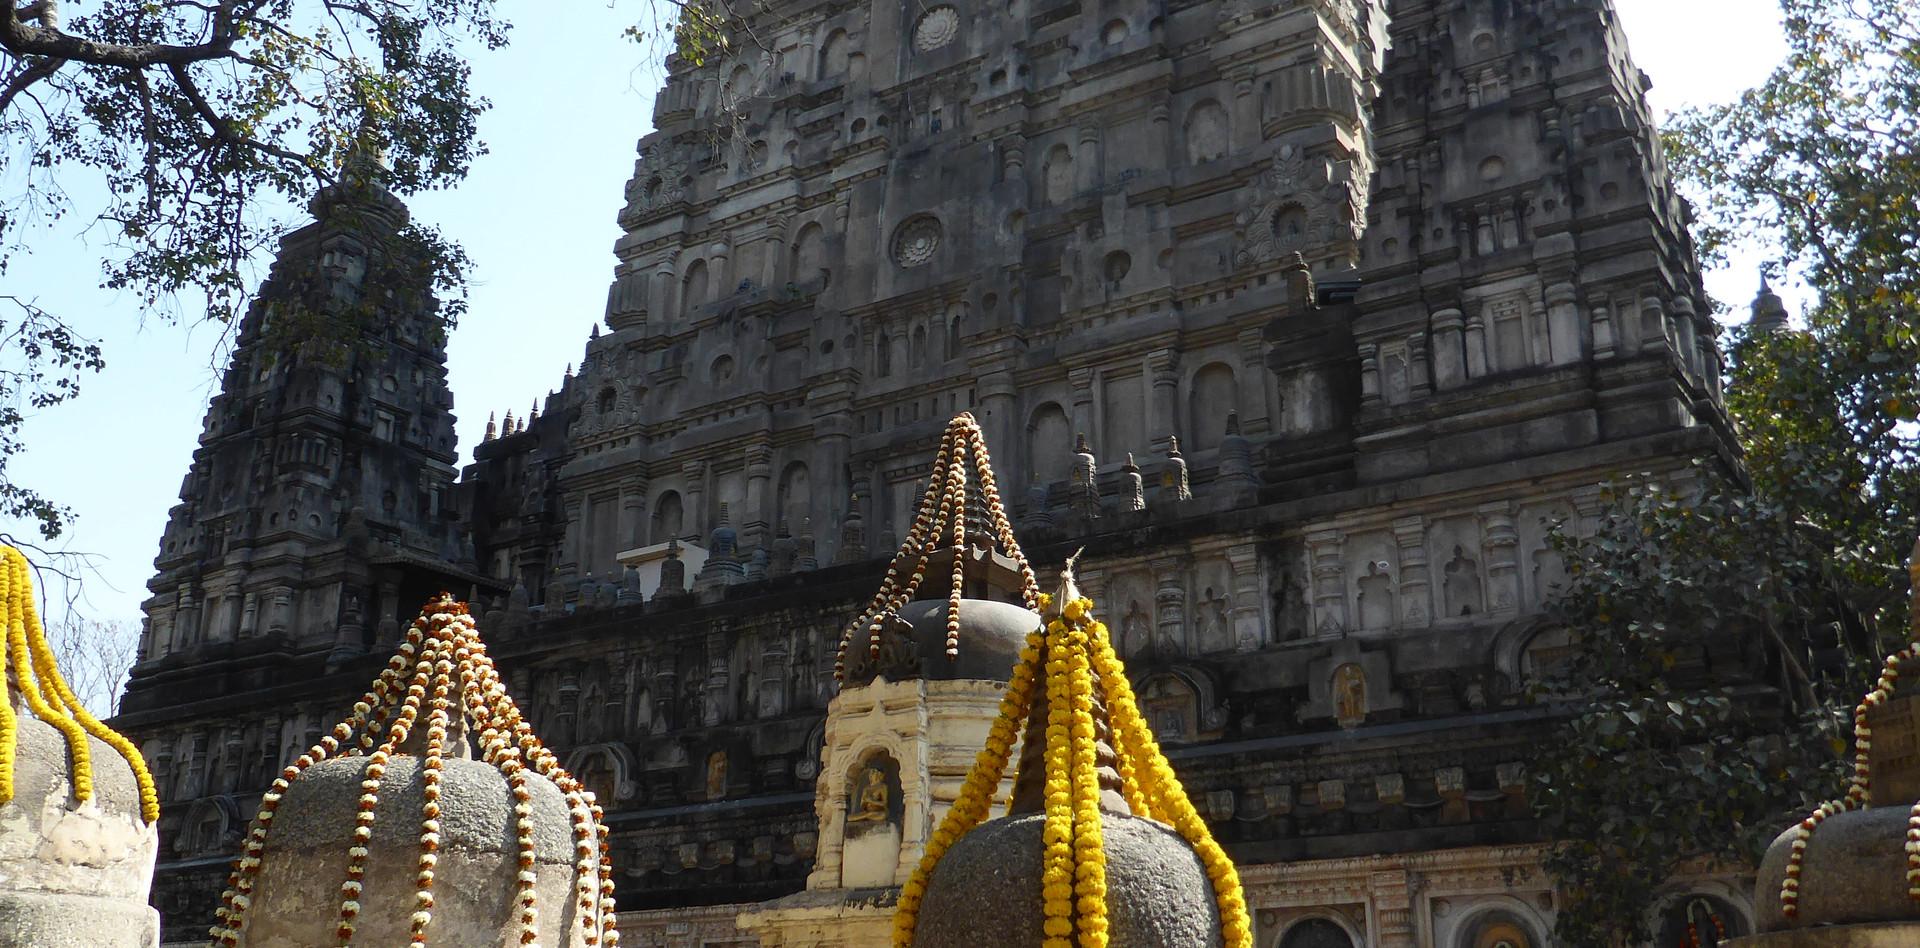 Hauptstupa und kleine stupa in Bodhgaya